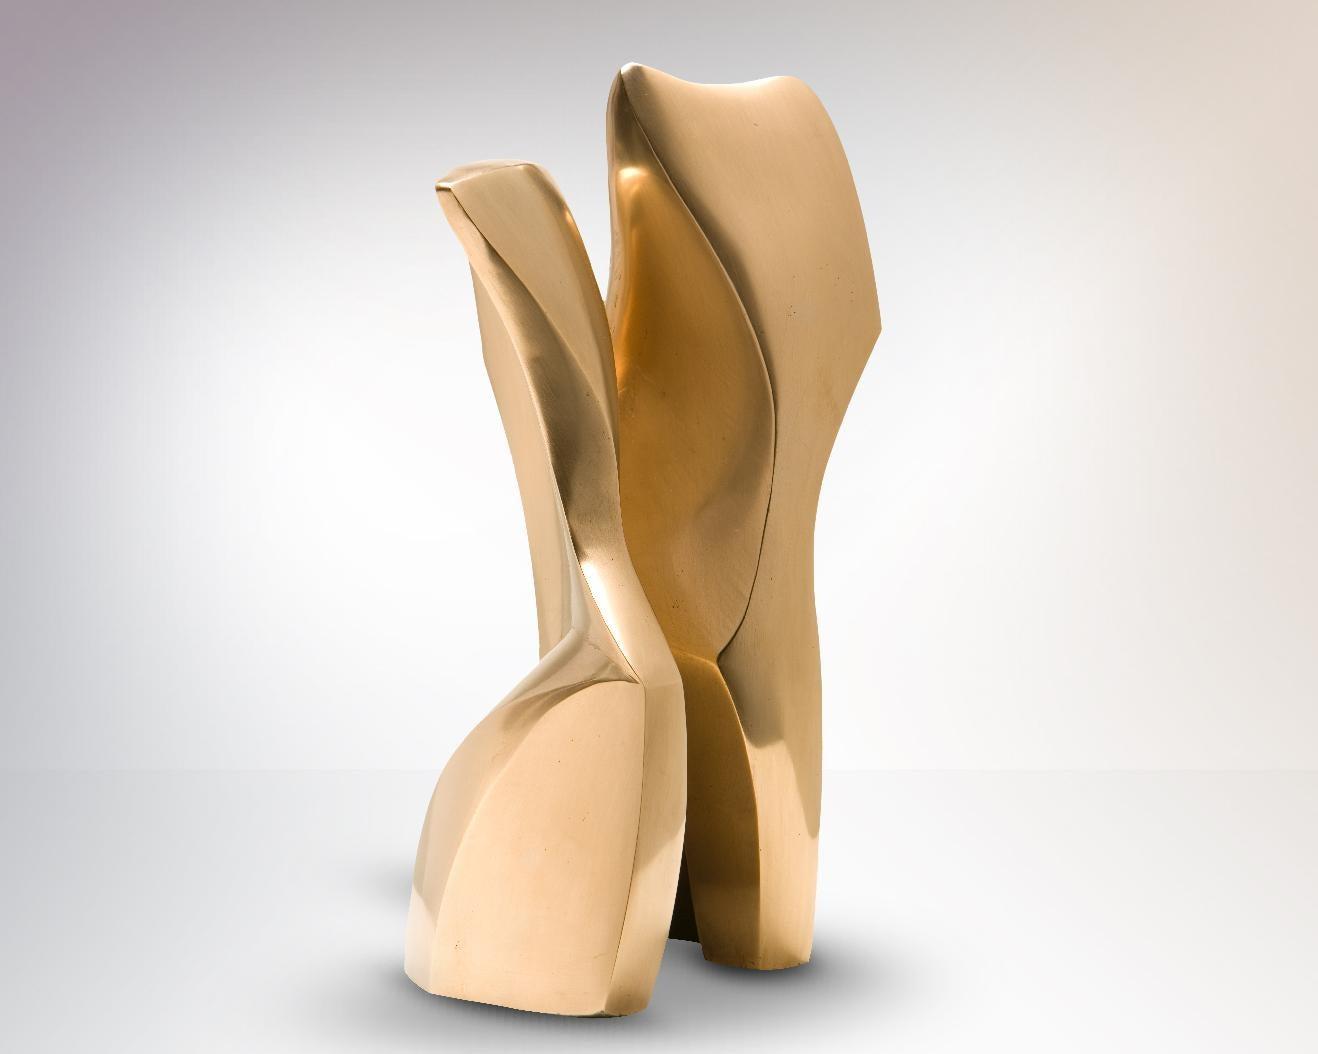 Bronze Sculpture 'Danza' by Carola Eggeling 'Polished Bronze'